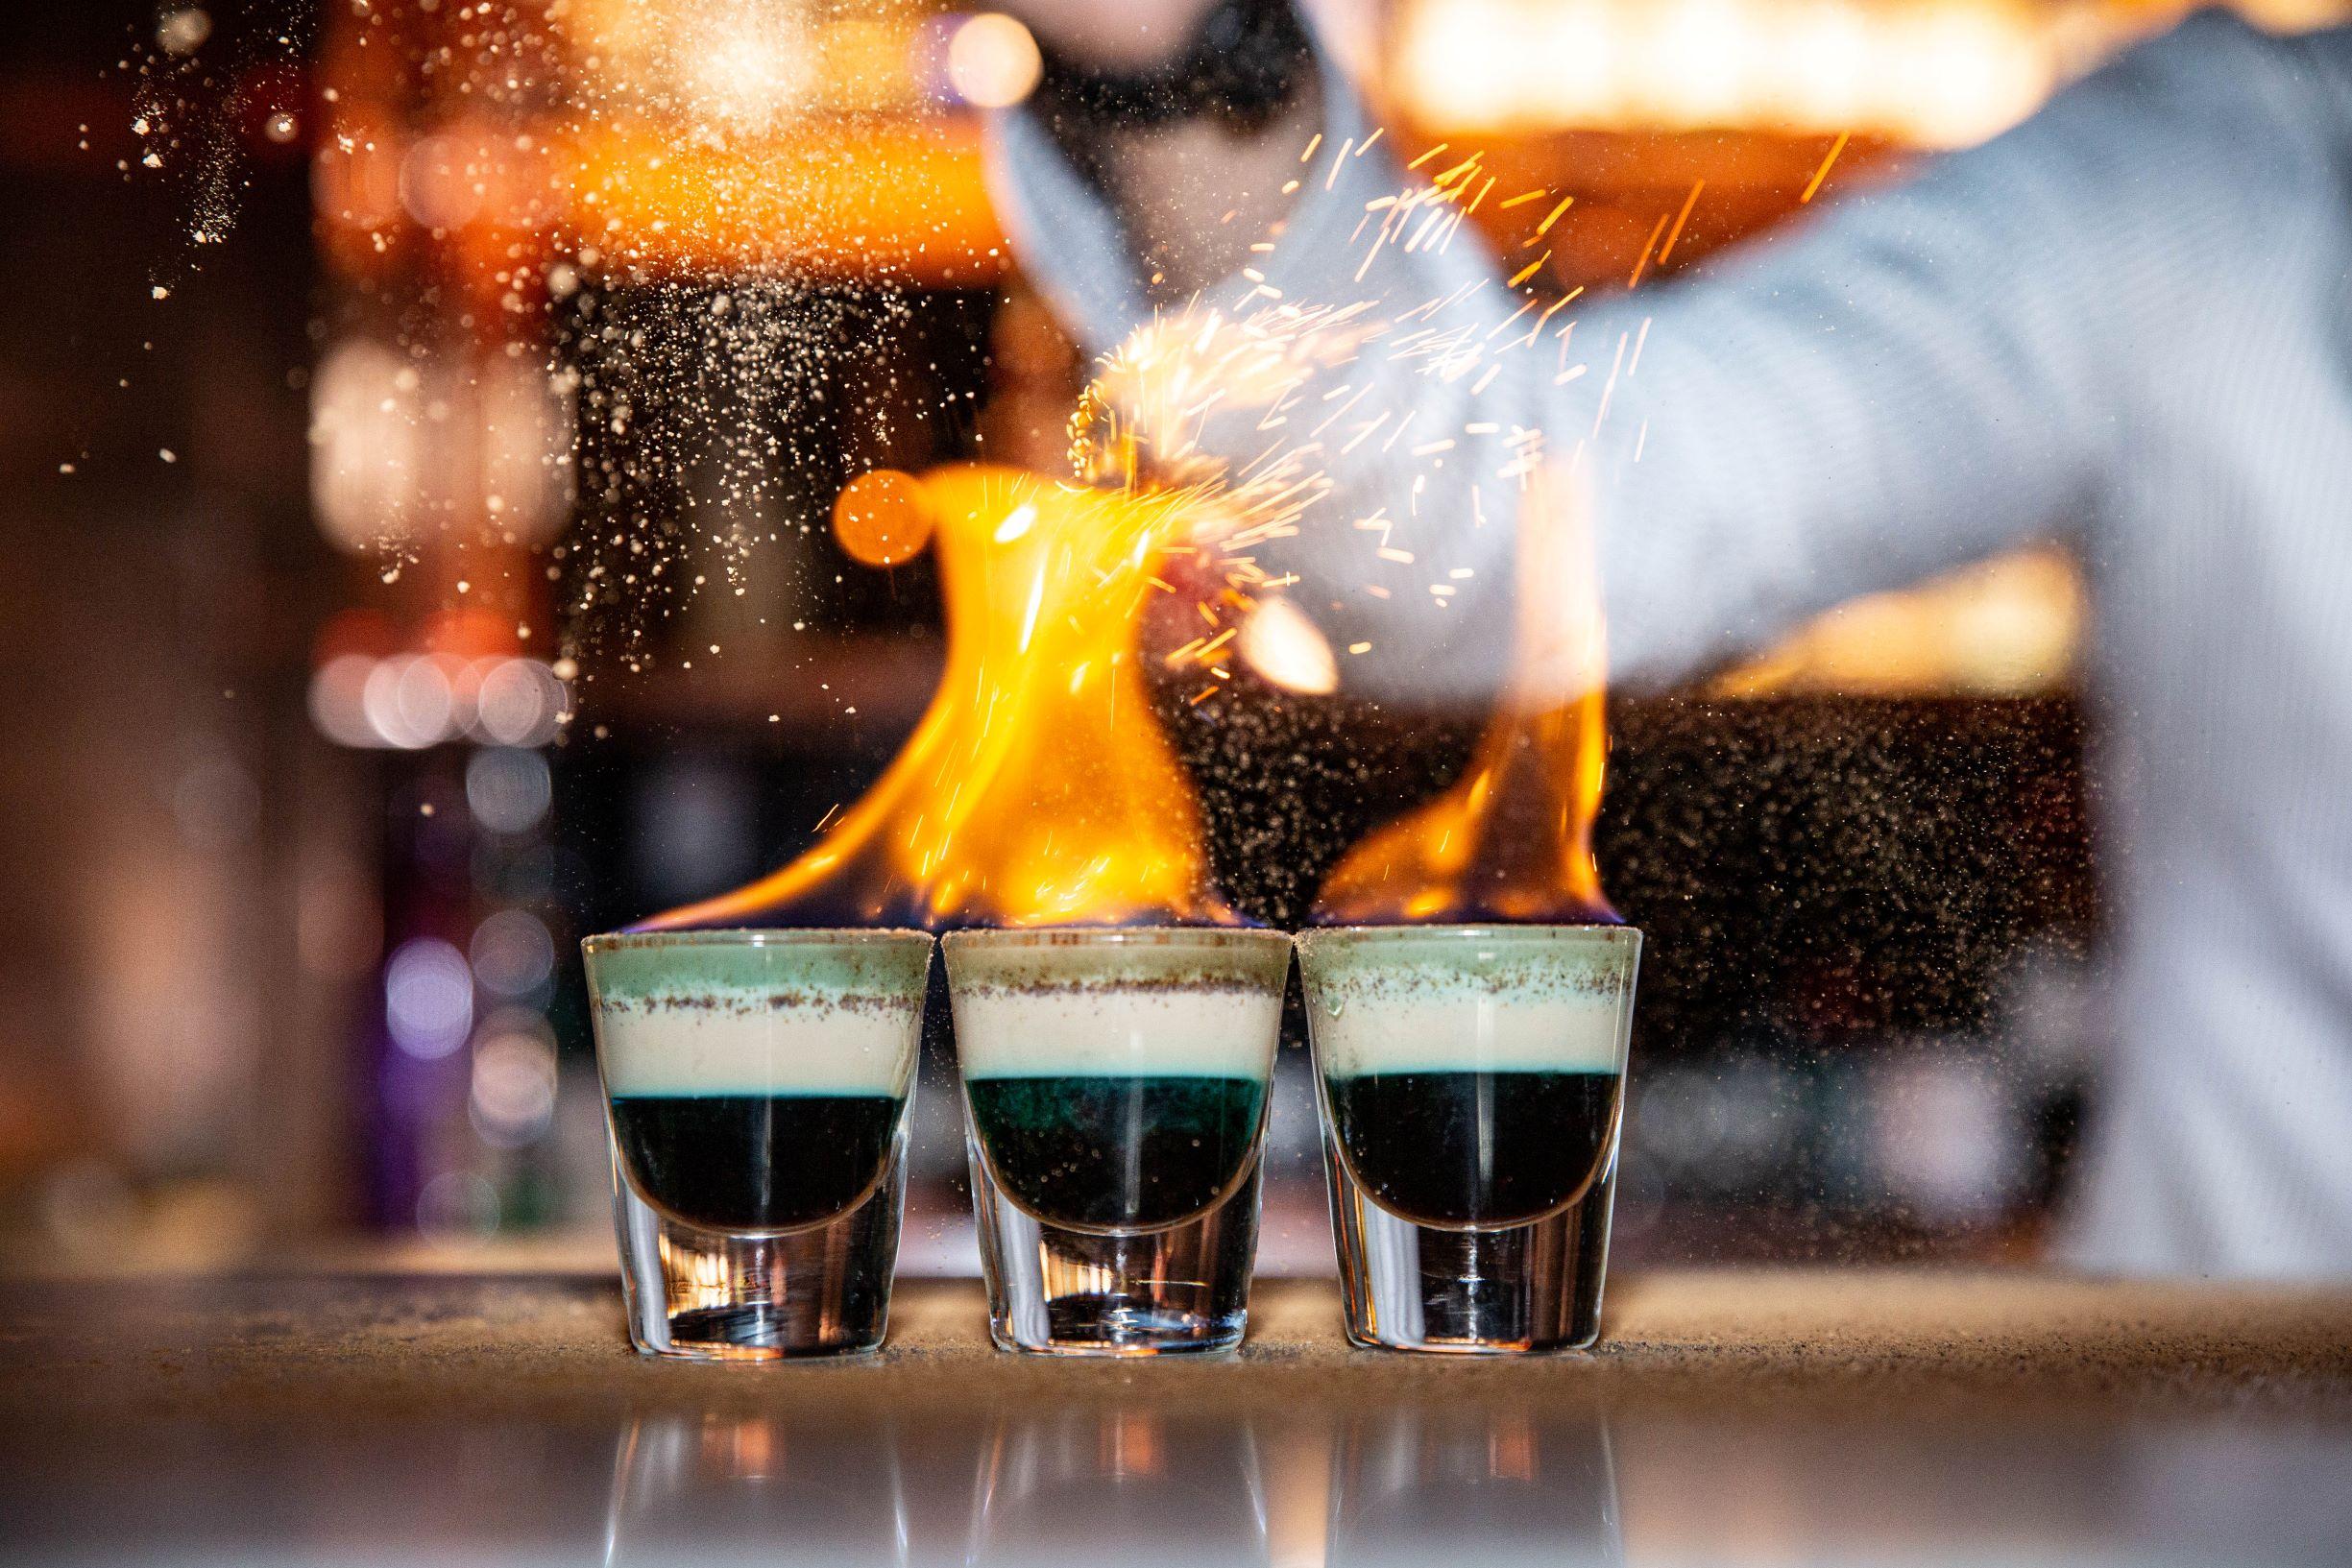 Cocktail Menu Items - Charlie Chans